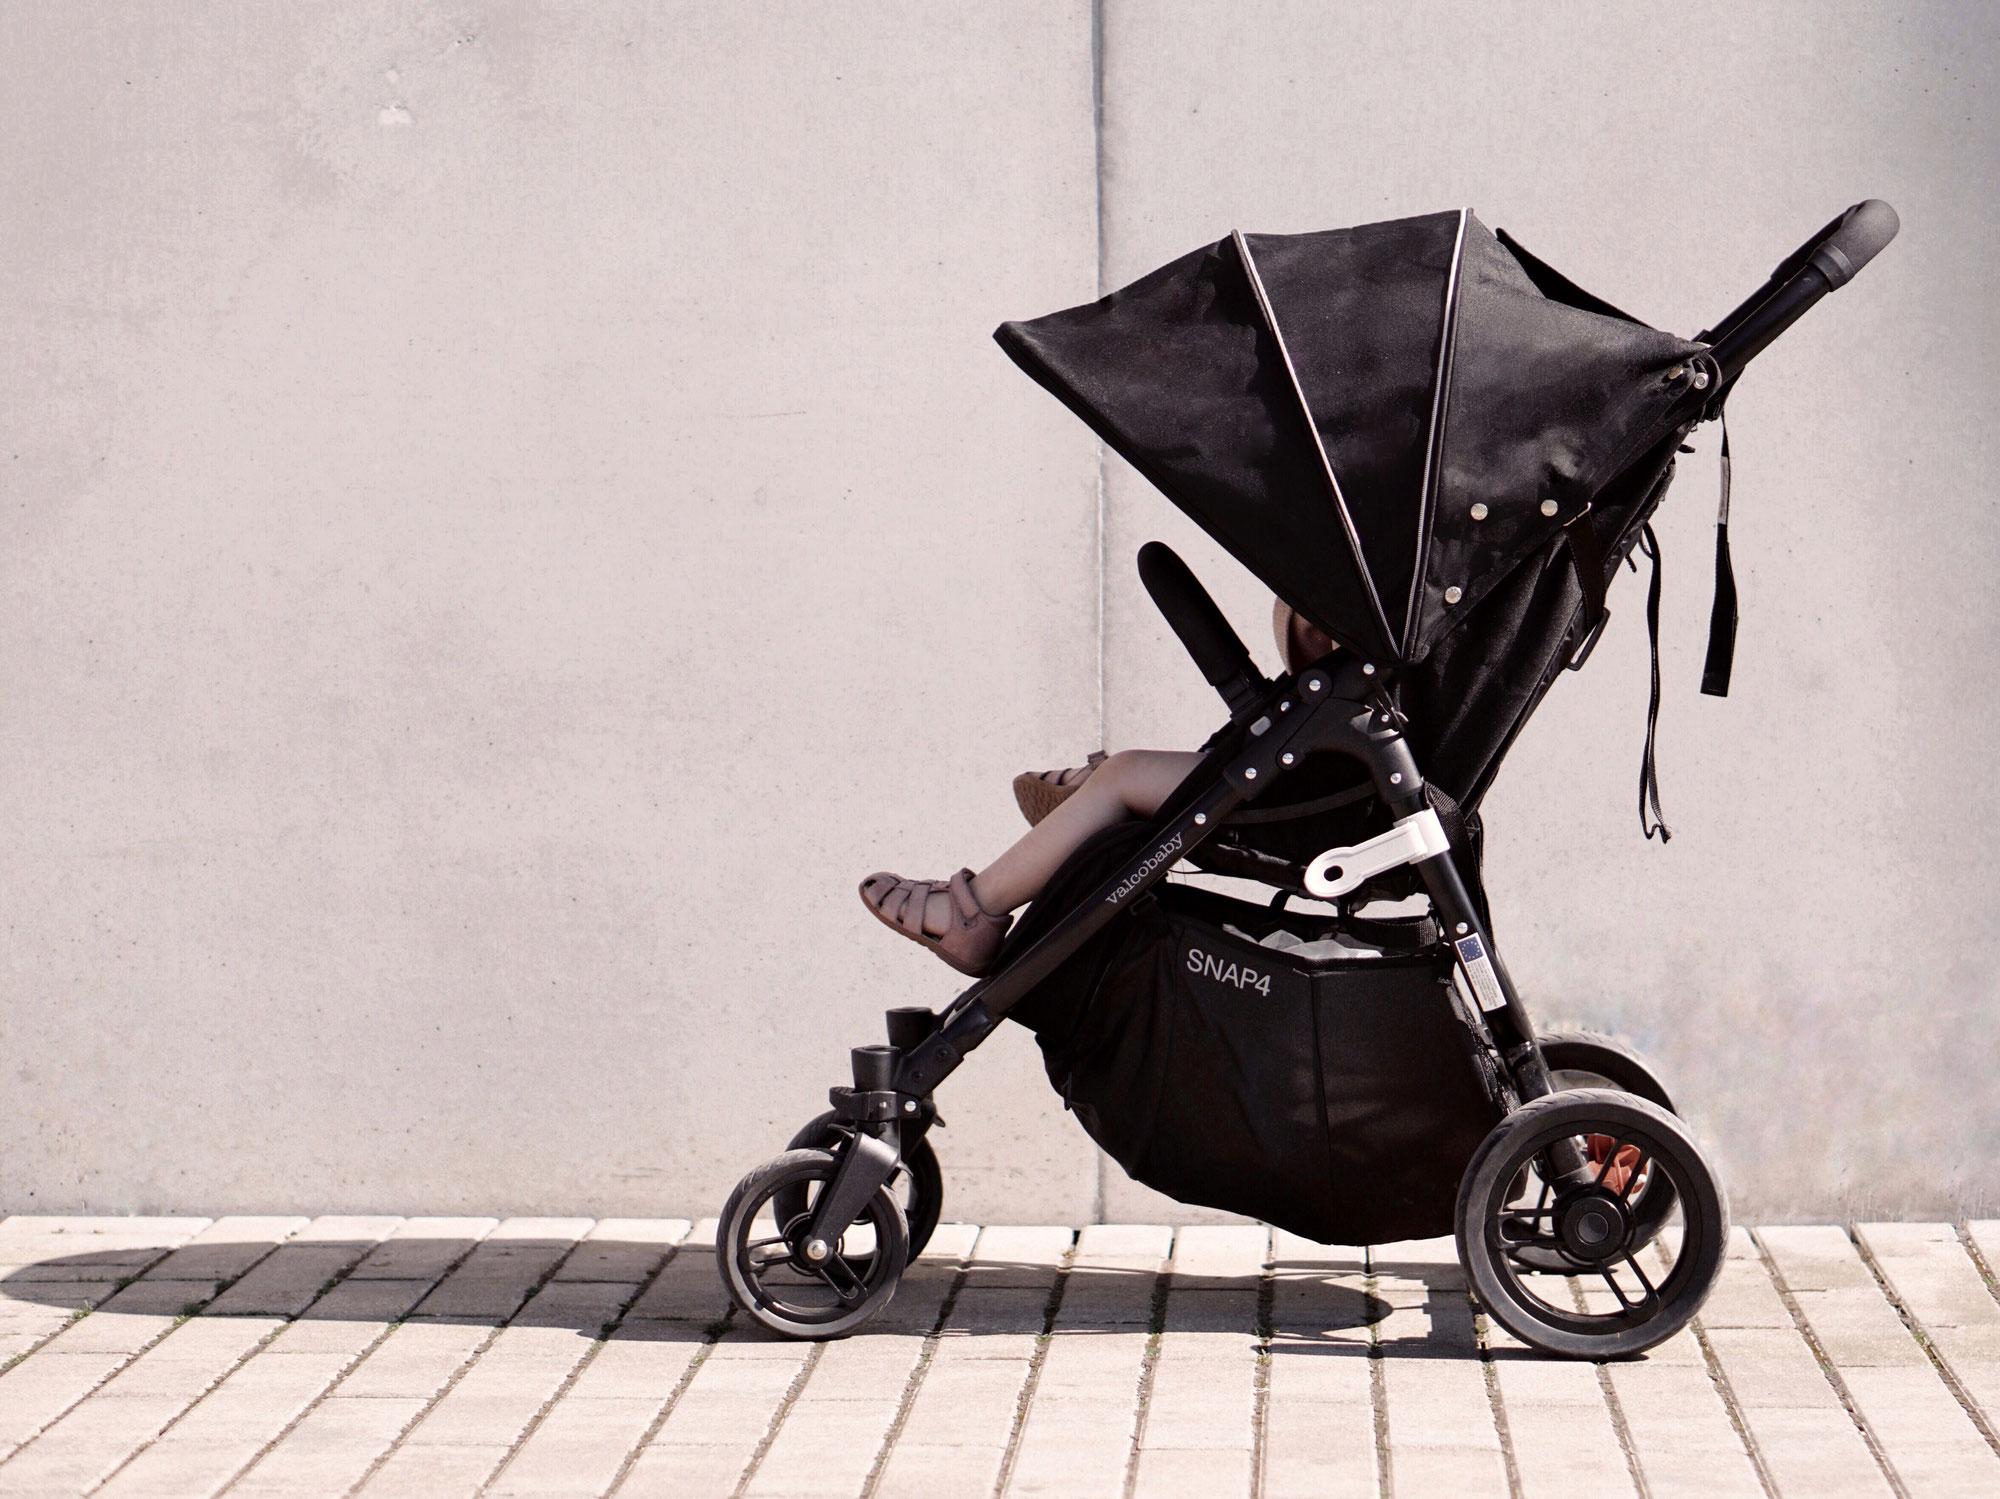 LENA LOVES: UNSER NEUER VALCO BABY SNAP 4 BUGGY